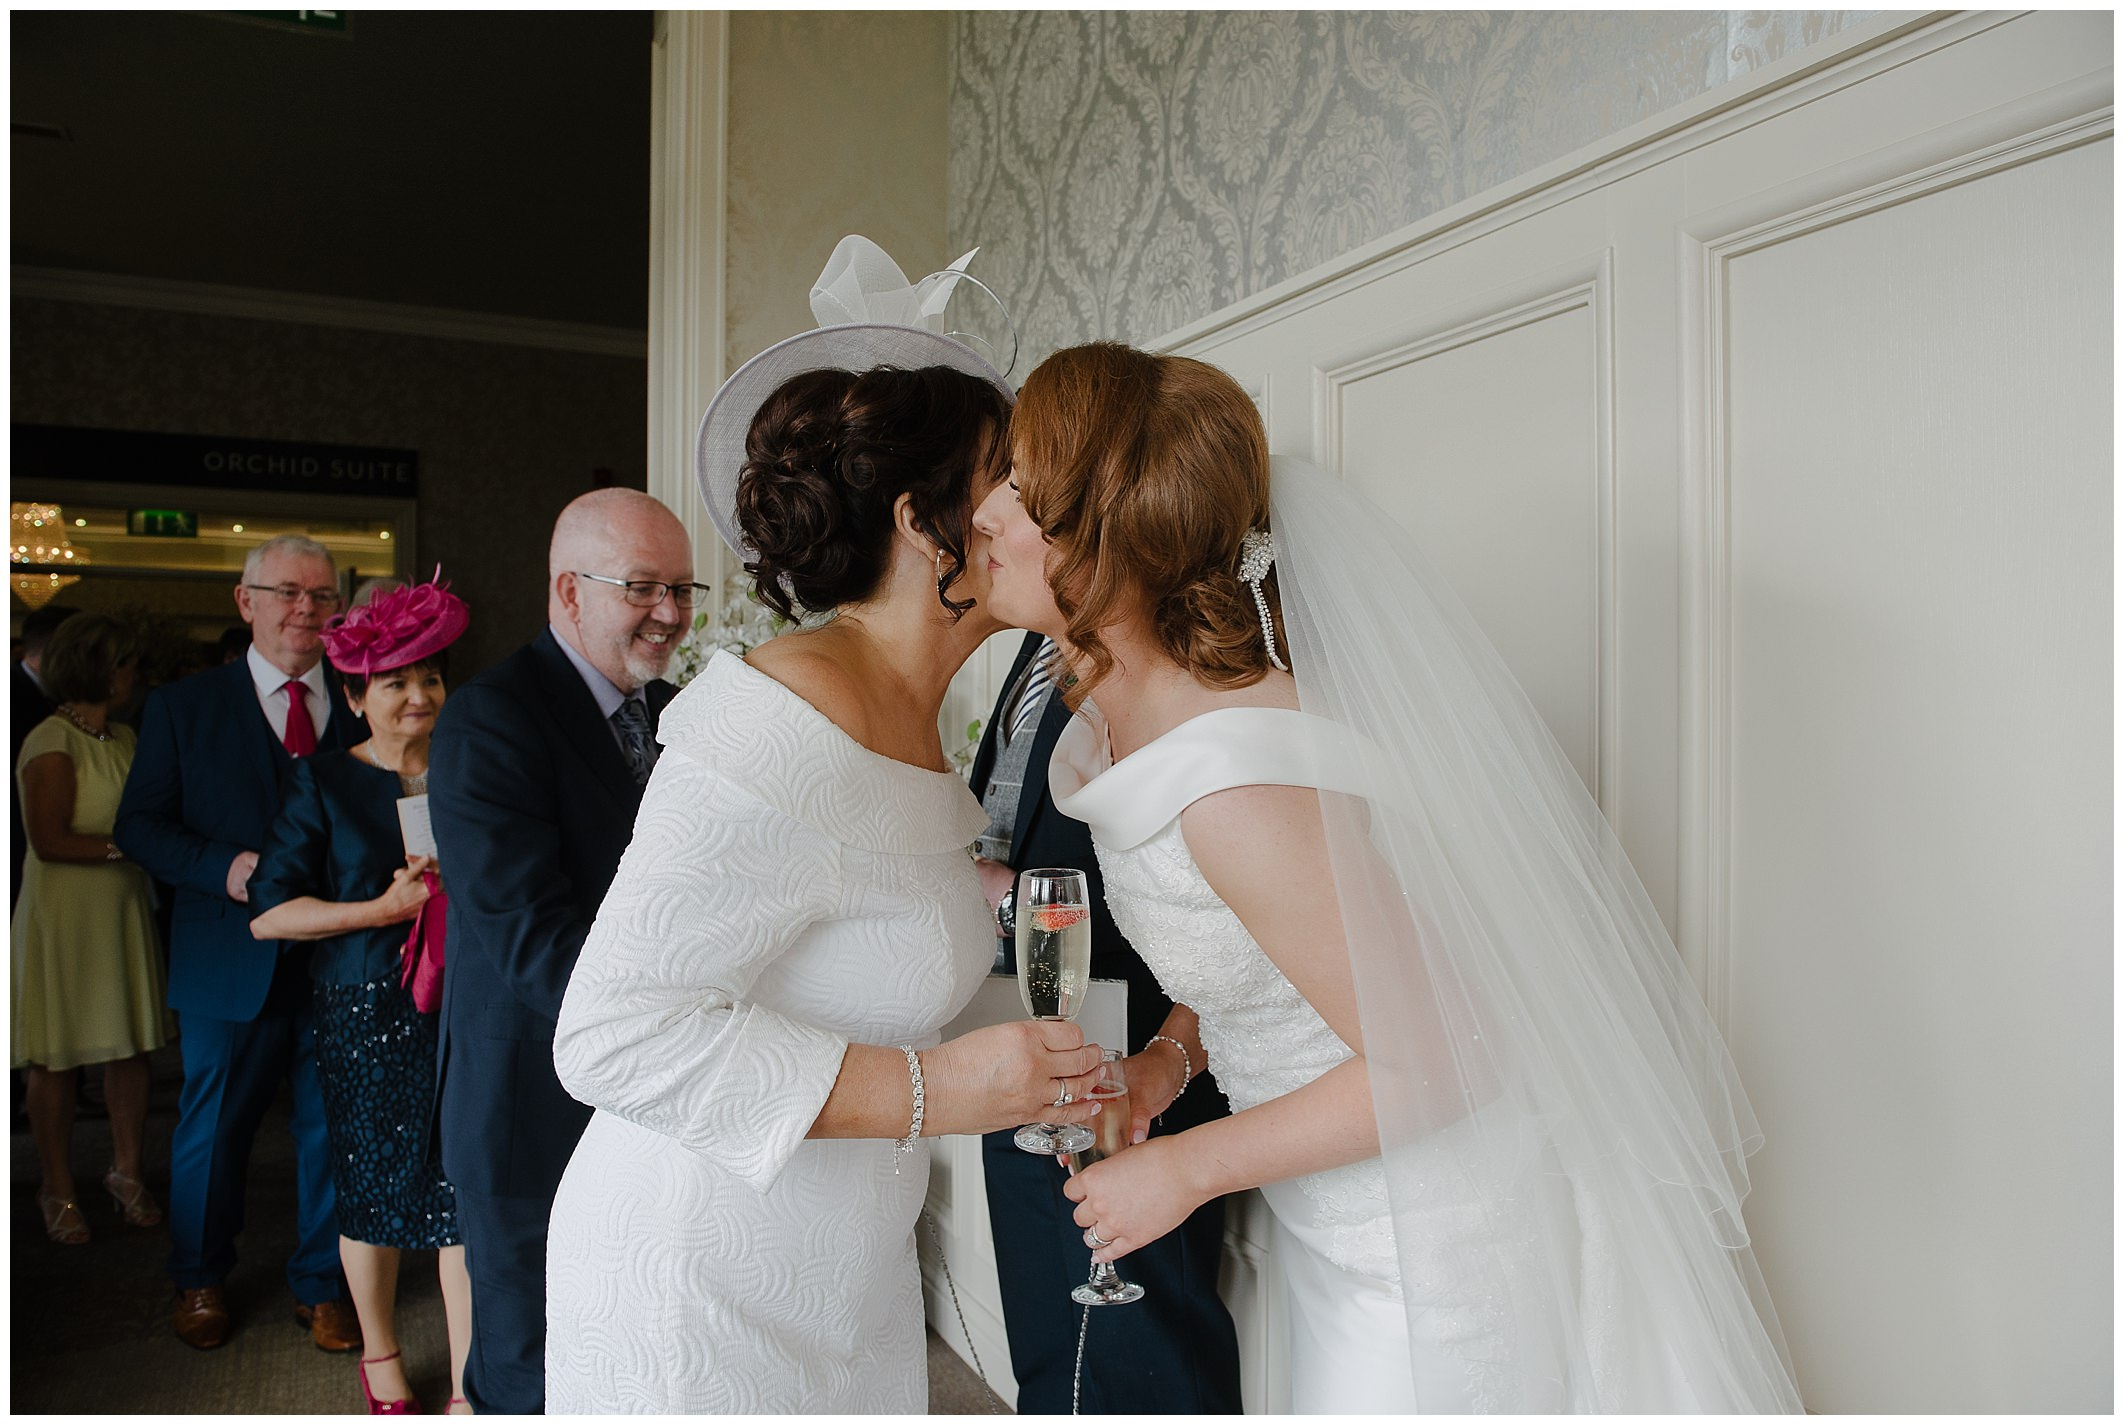 corick-house-wedding-hannah-gary-jude-browne-photography_0046.jpg